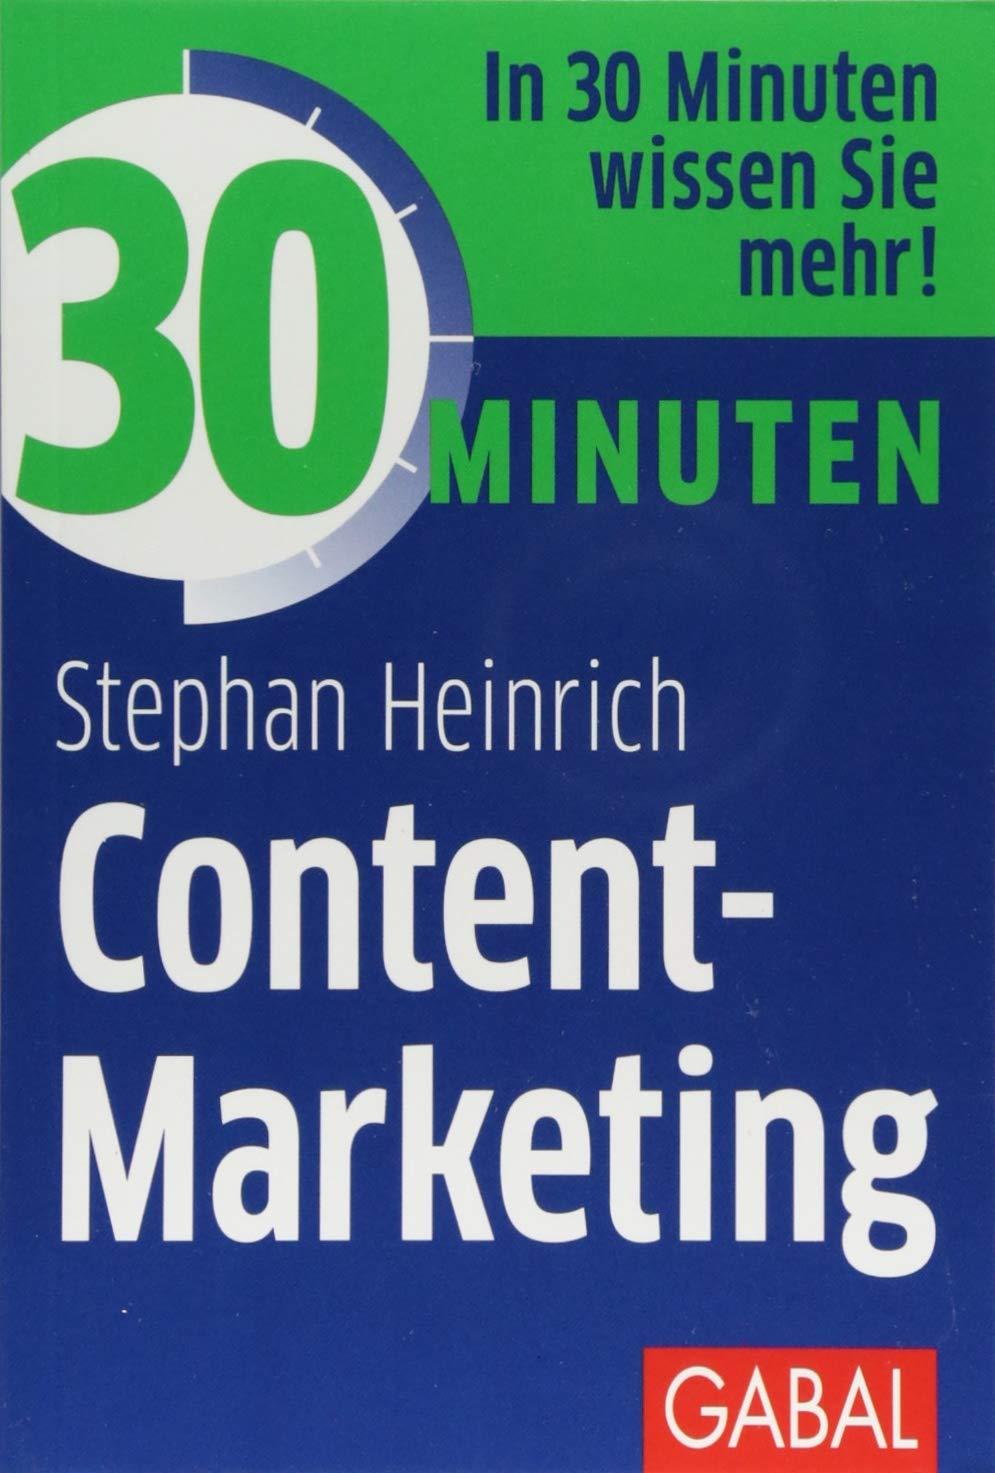 30 Minuten Content-Marketing Taschenbuch – 6. September 2018 Stephan Heinrich GABAL 3869368829 Wirtschaft / Werbung